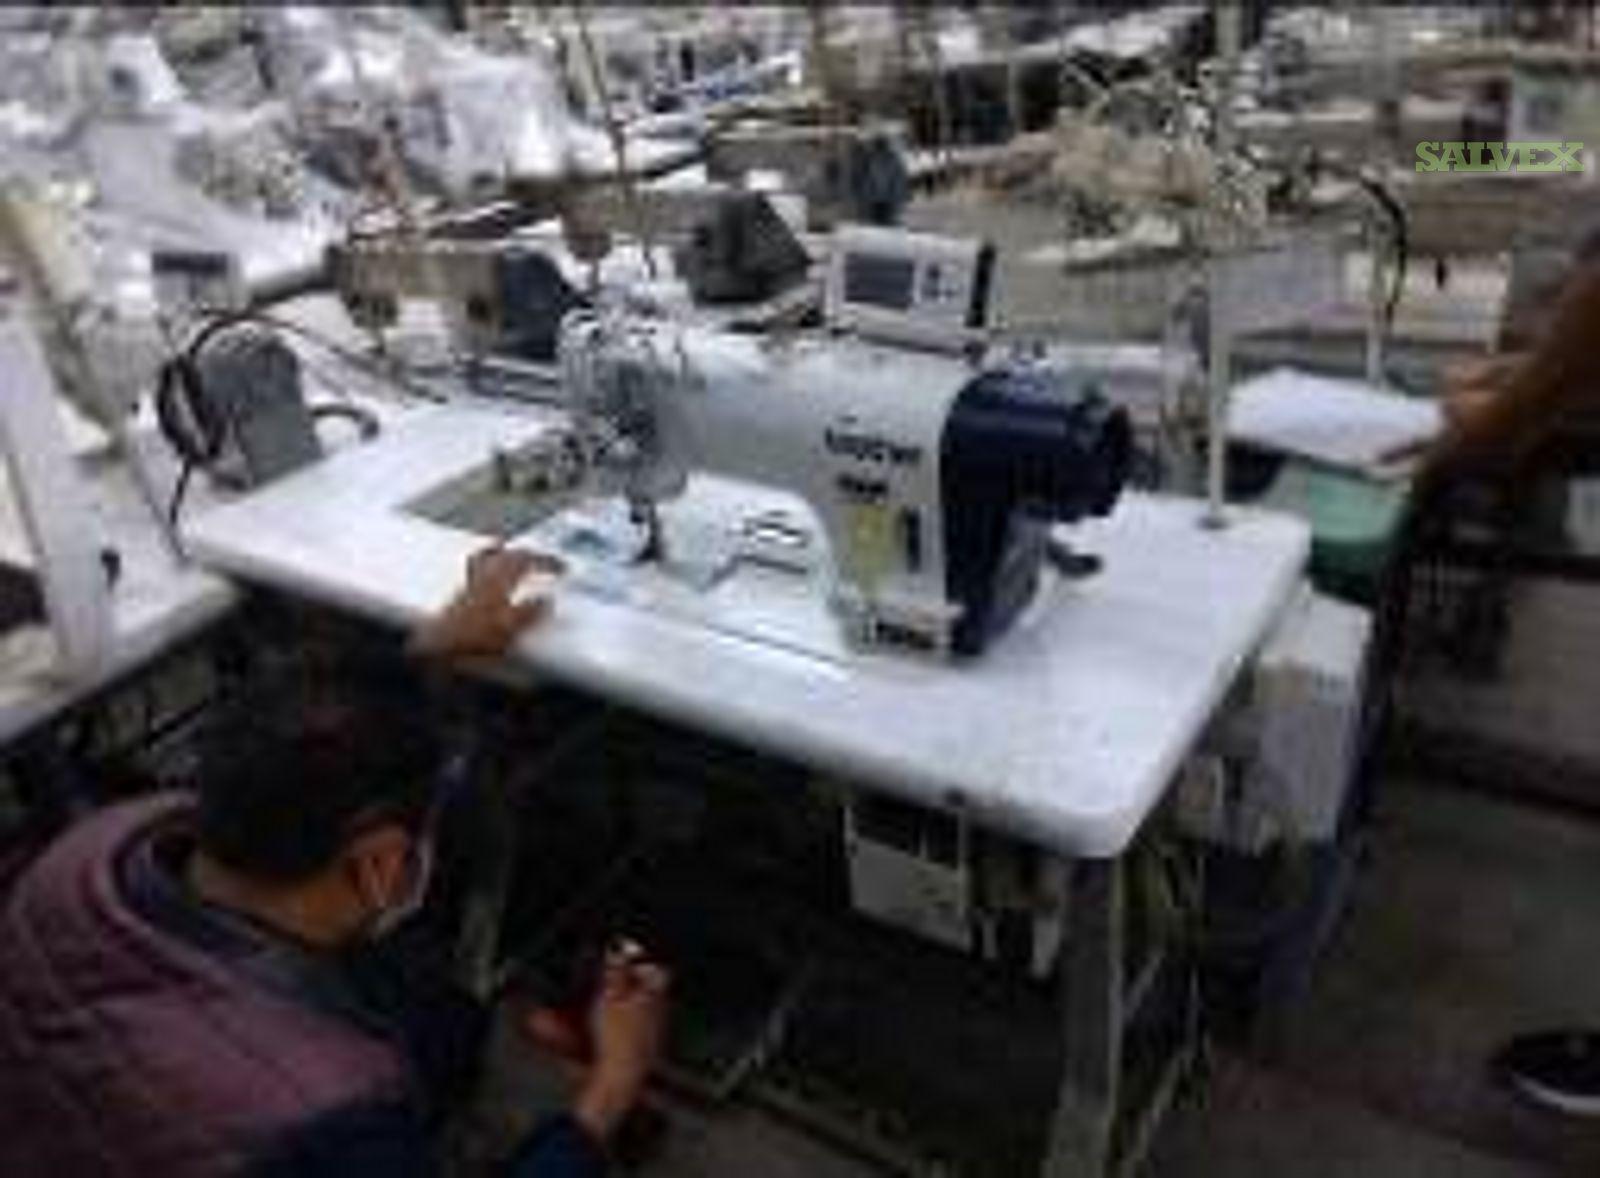 Sewing Machines, Computers, Monitors, Printers, etc. (Damaged by Hurricanes ETA and IOTA)